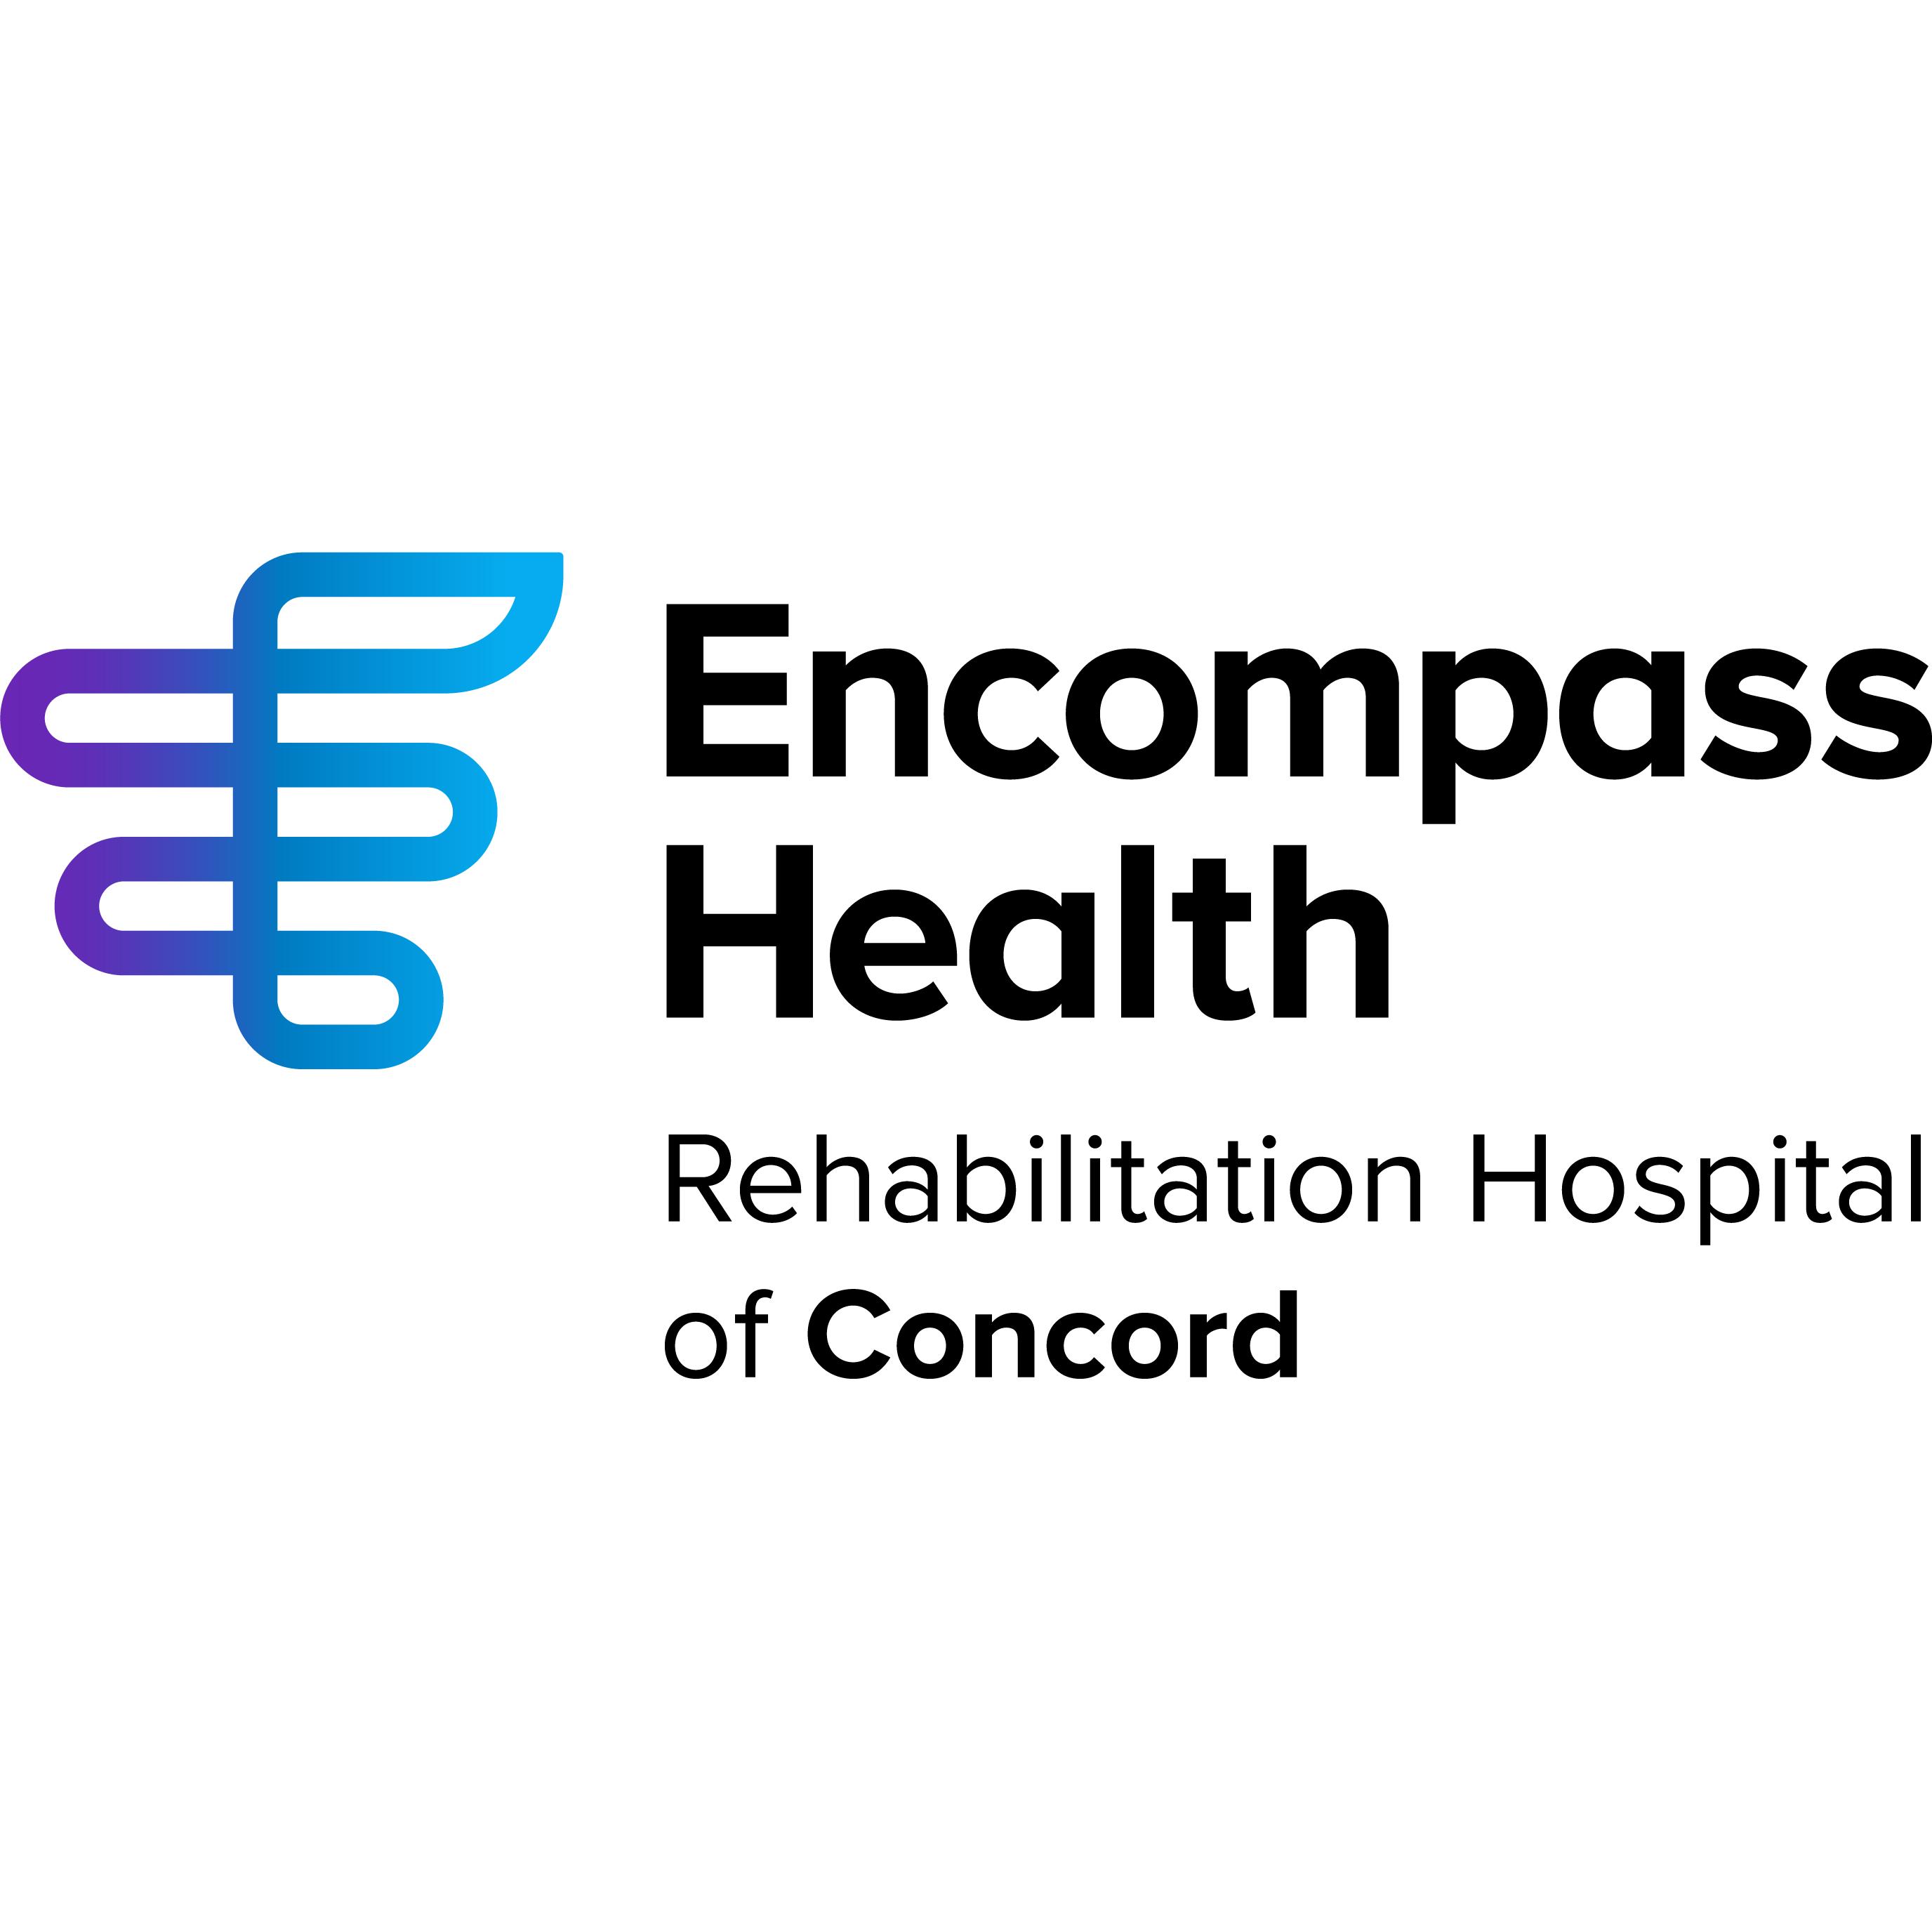 Encompass Health Rehabilitation Hospital of Concord